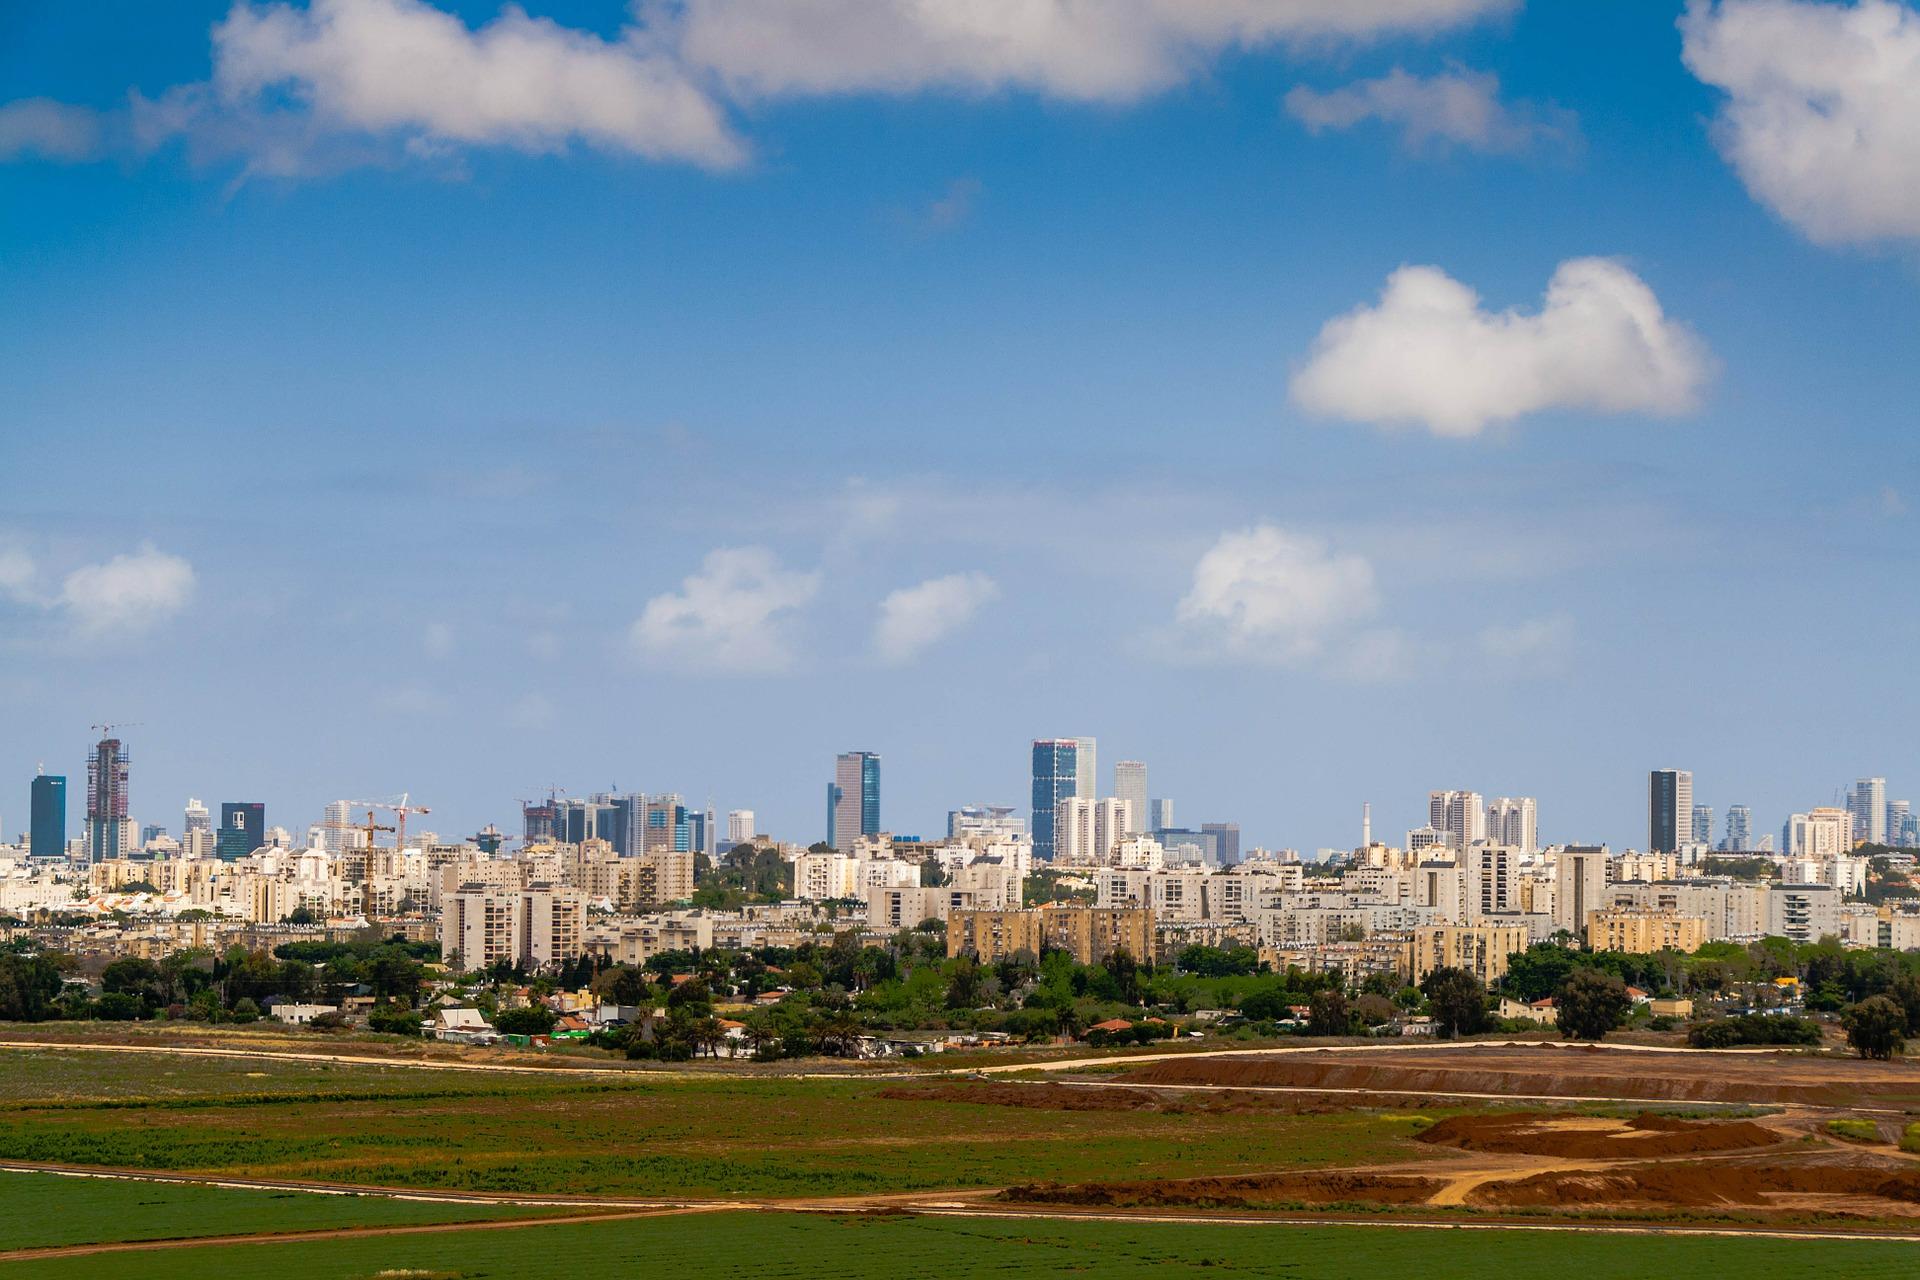 Tel Aviv. Image by Nadya Il from Pixabay